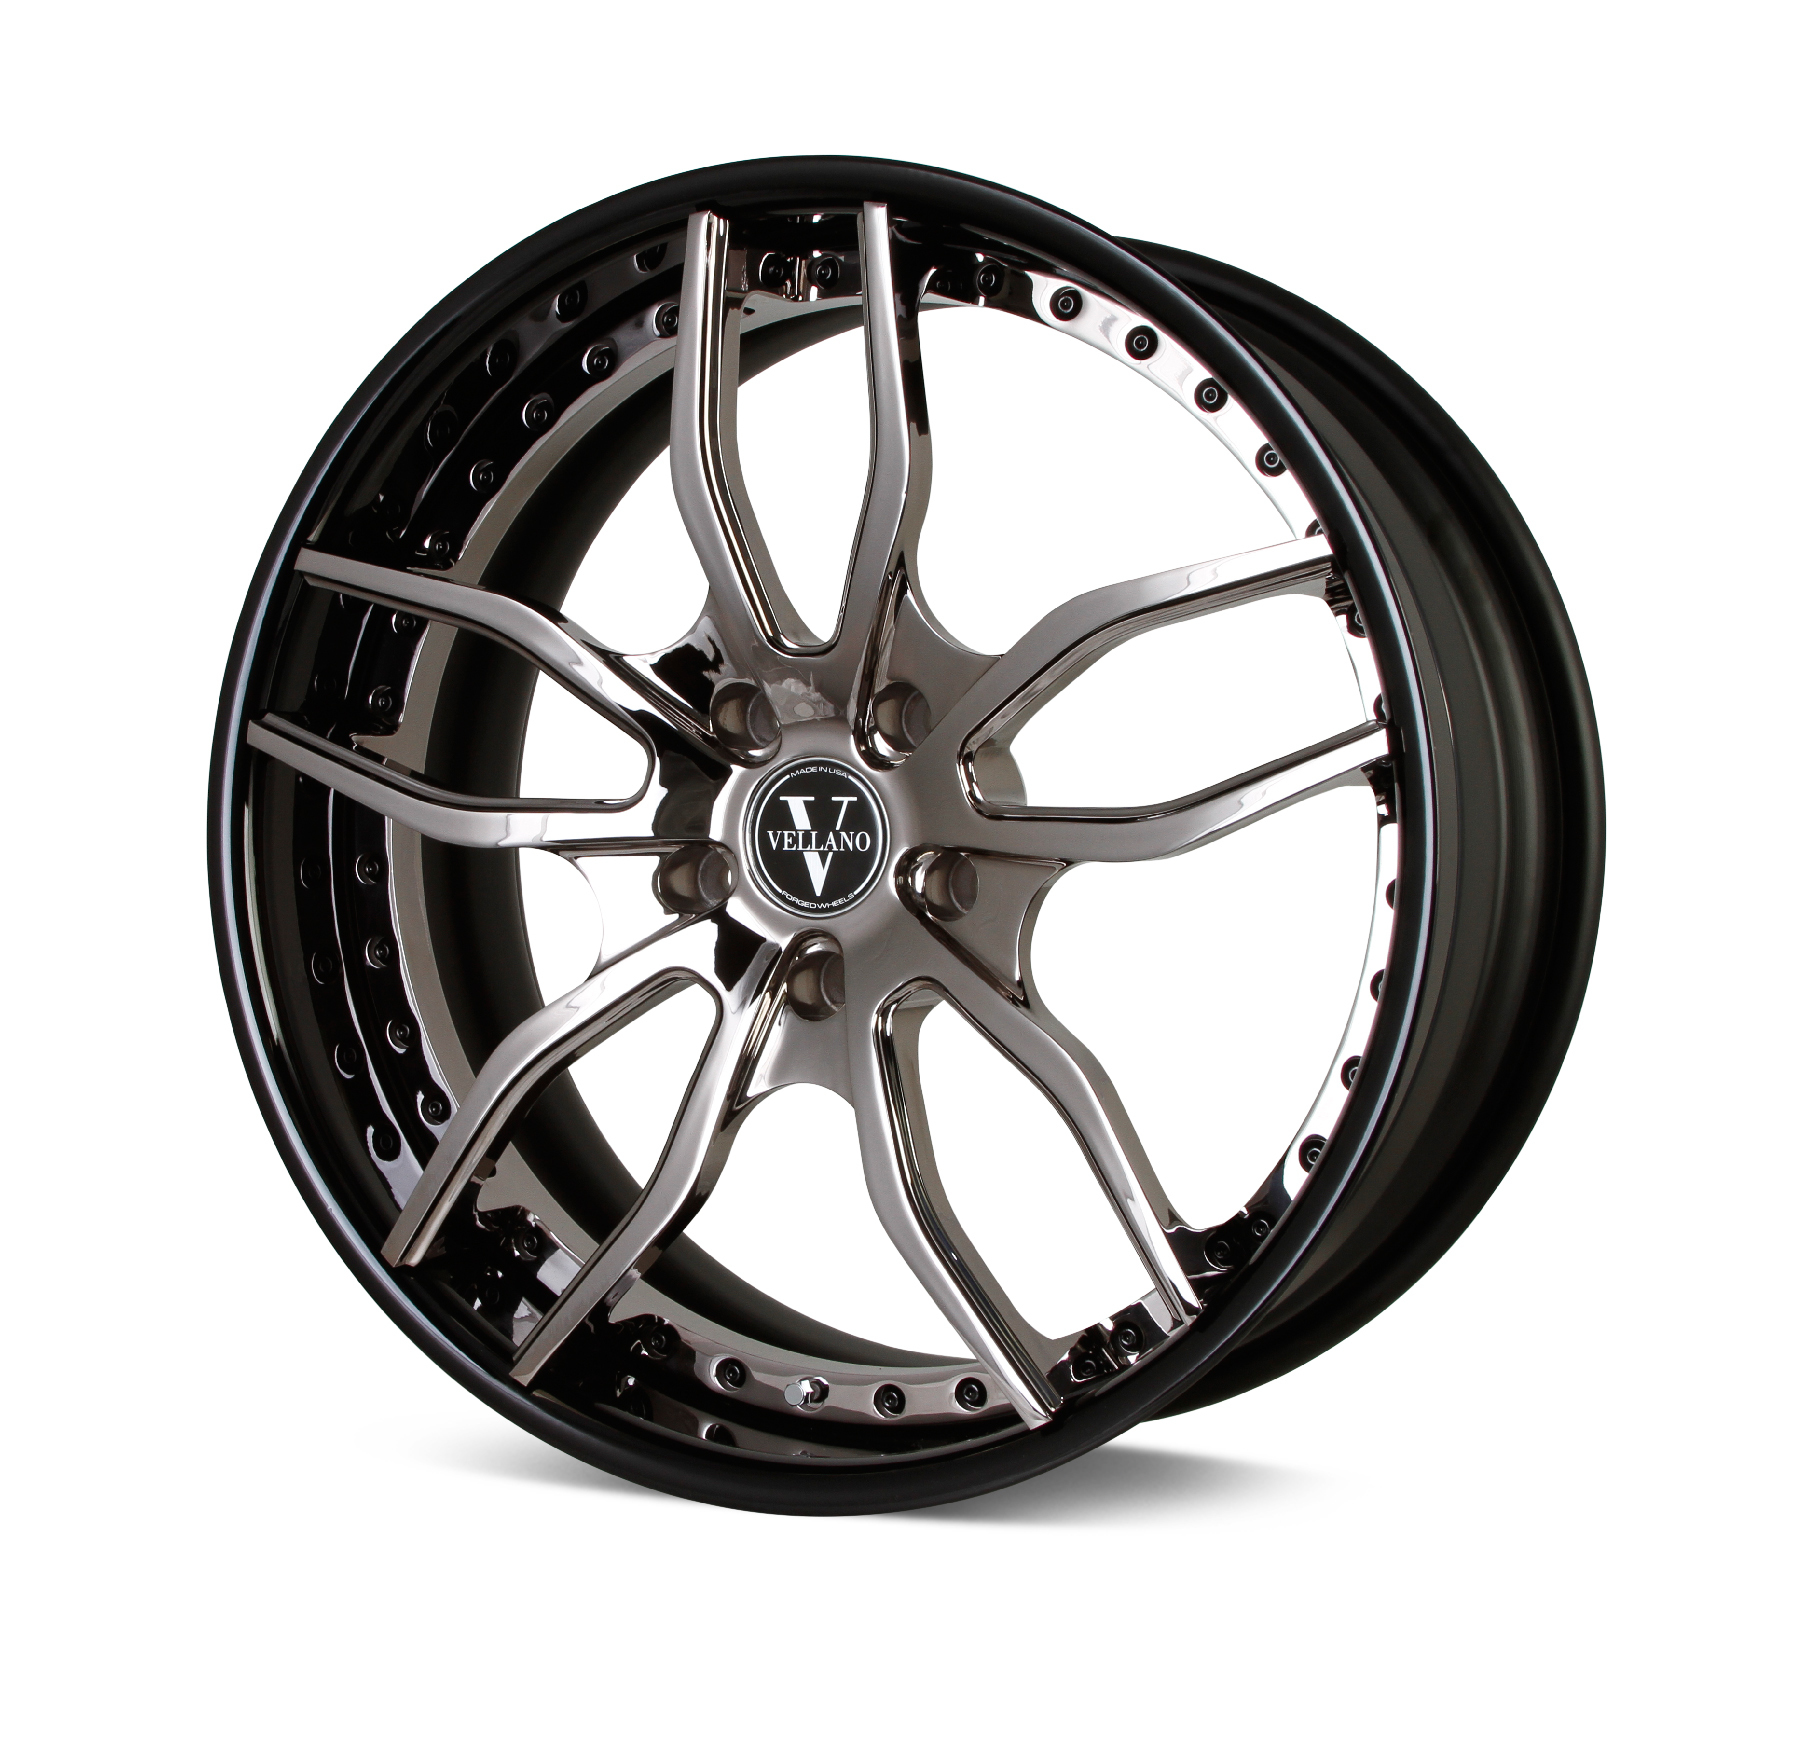 Vellano VCС forged wheels